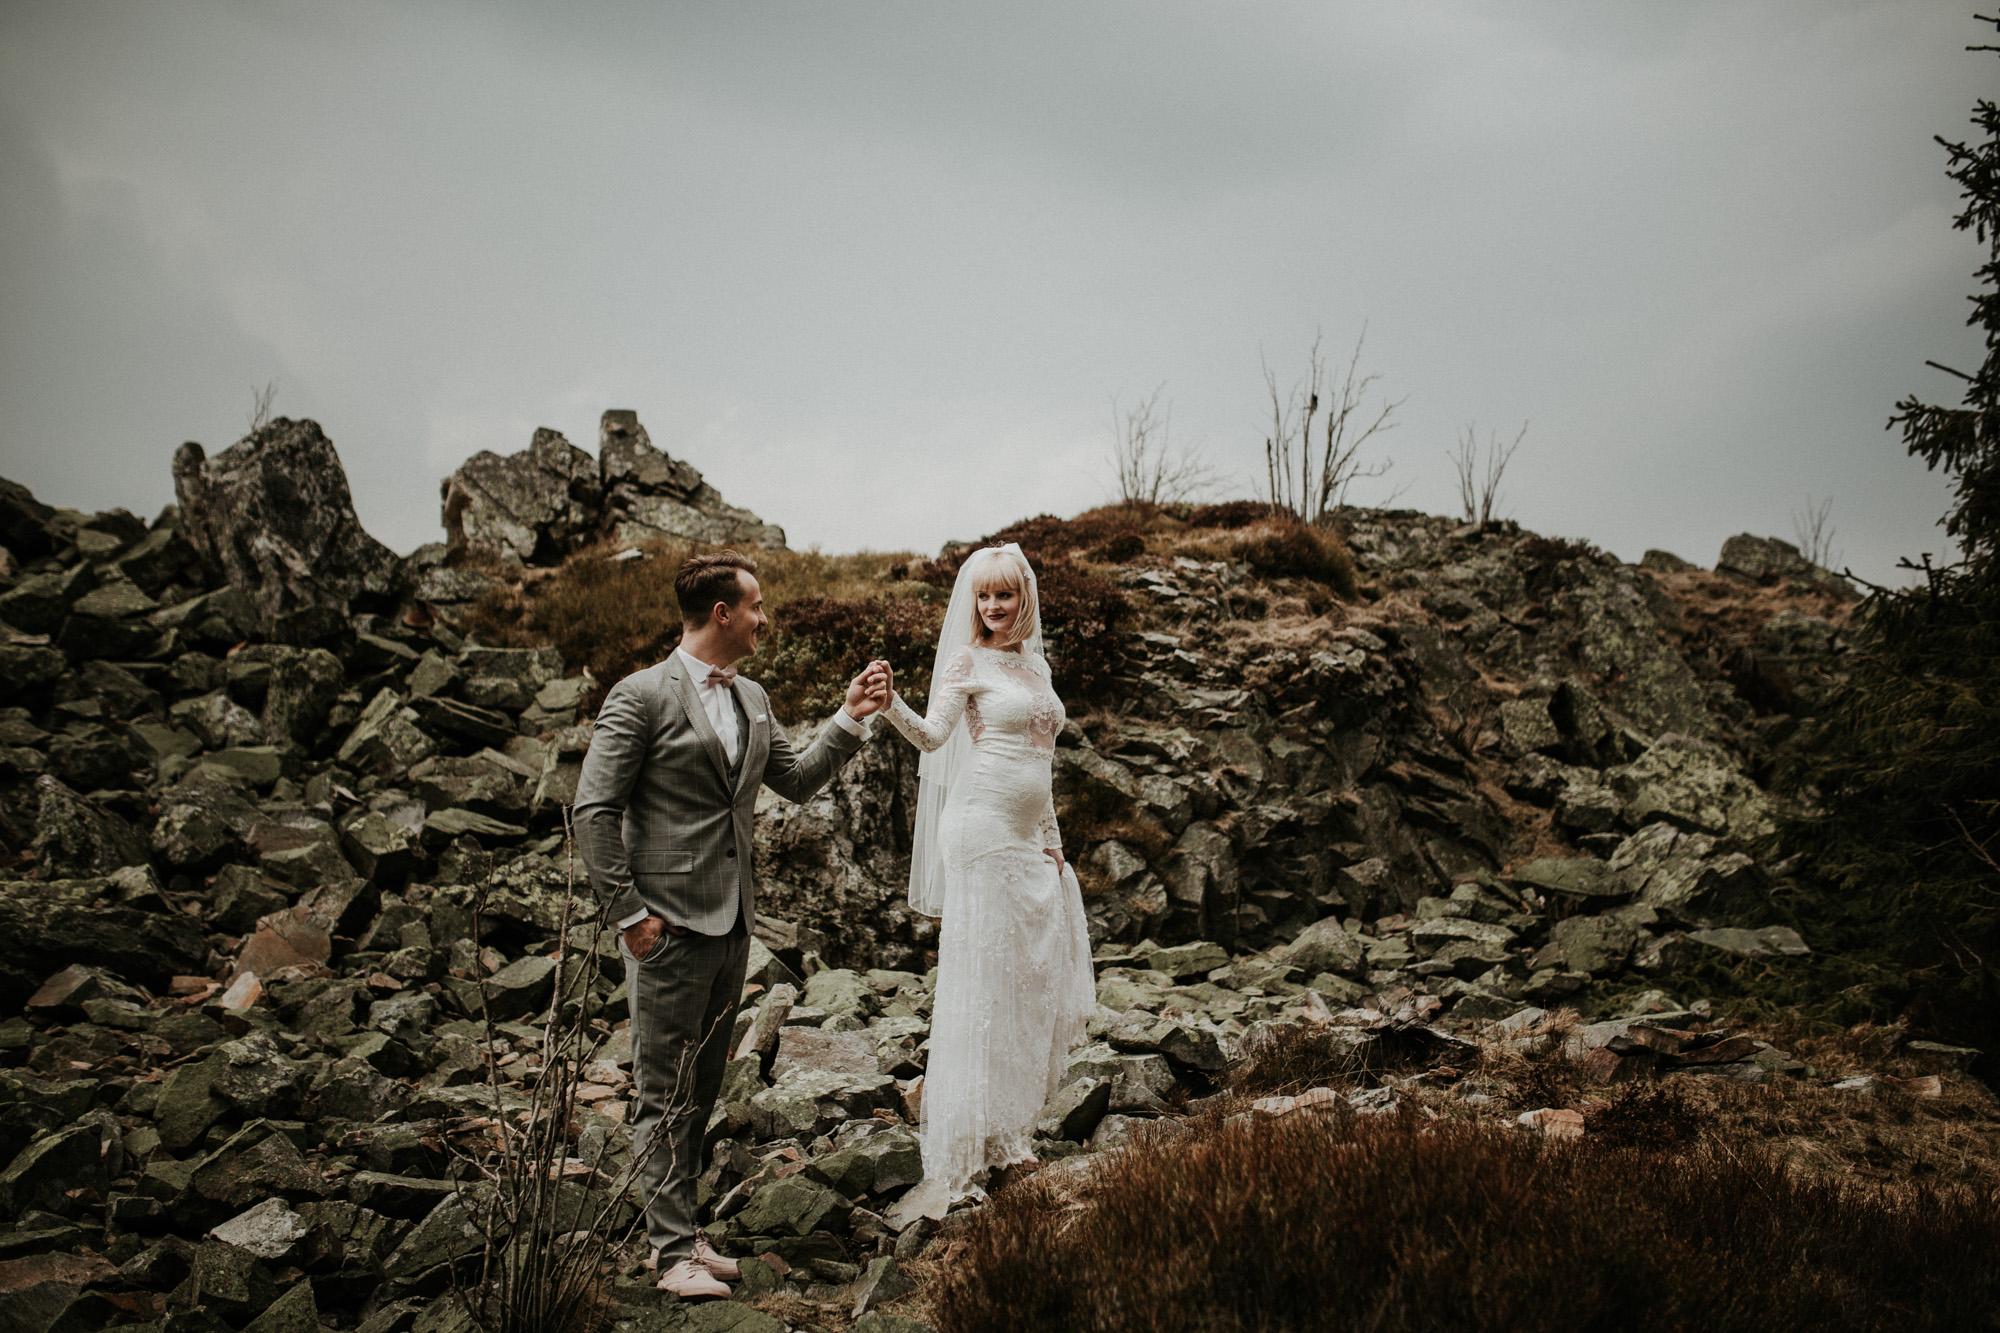 DanielaMarquardtPhotography_Hochzeitsfotograf_Düsseldorf_Köln_Mallorca_Bayern_Austria_Harz_LinaundMaik_Afterwedding-Shooting_Weddingphotographer_Ibiza_Tuskany_Italien_Toskana90